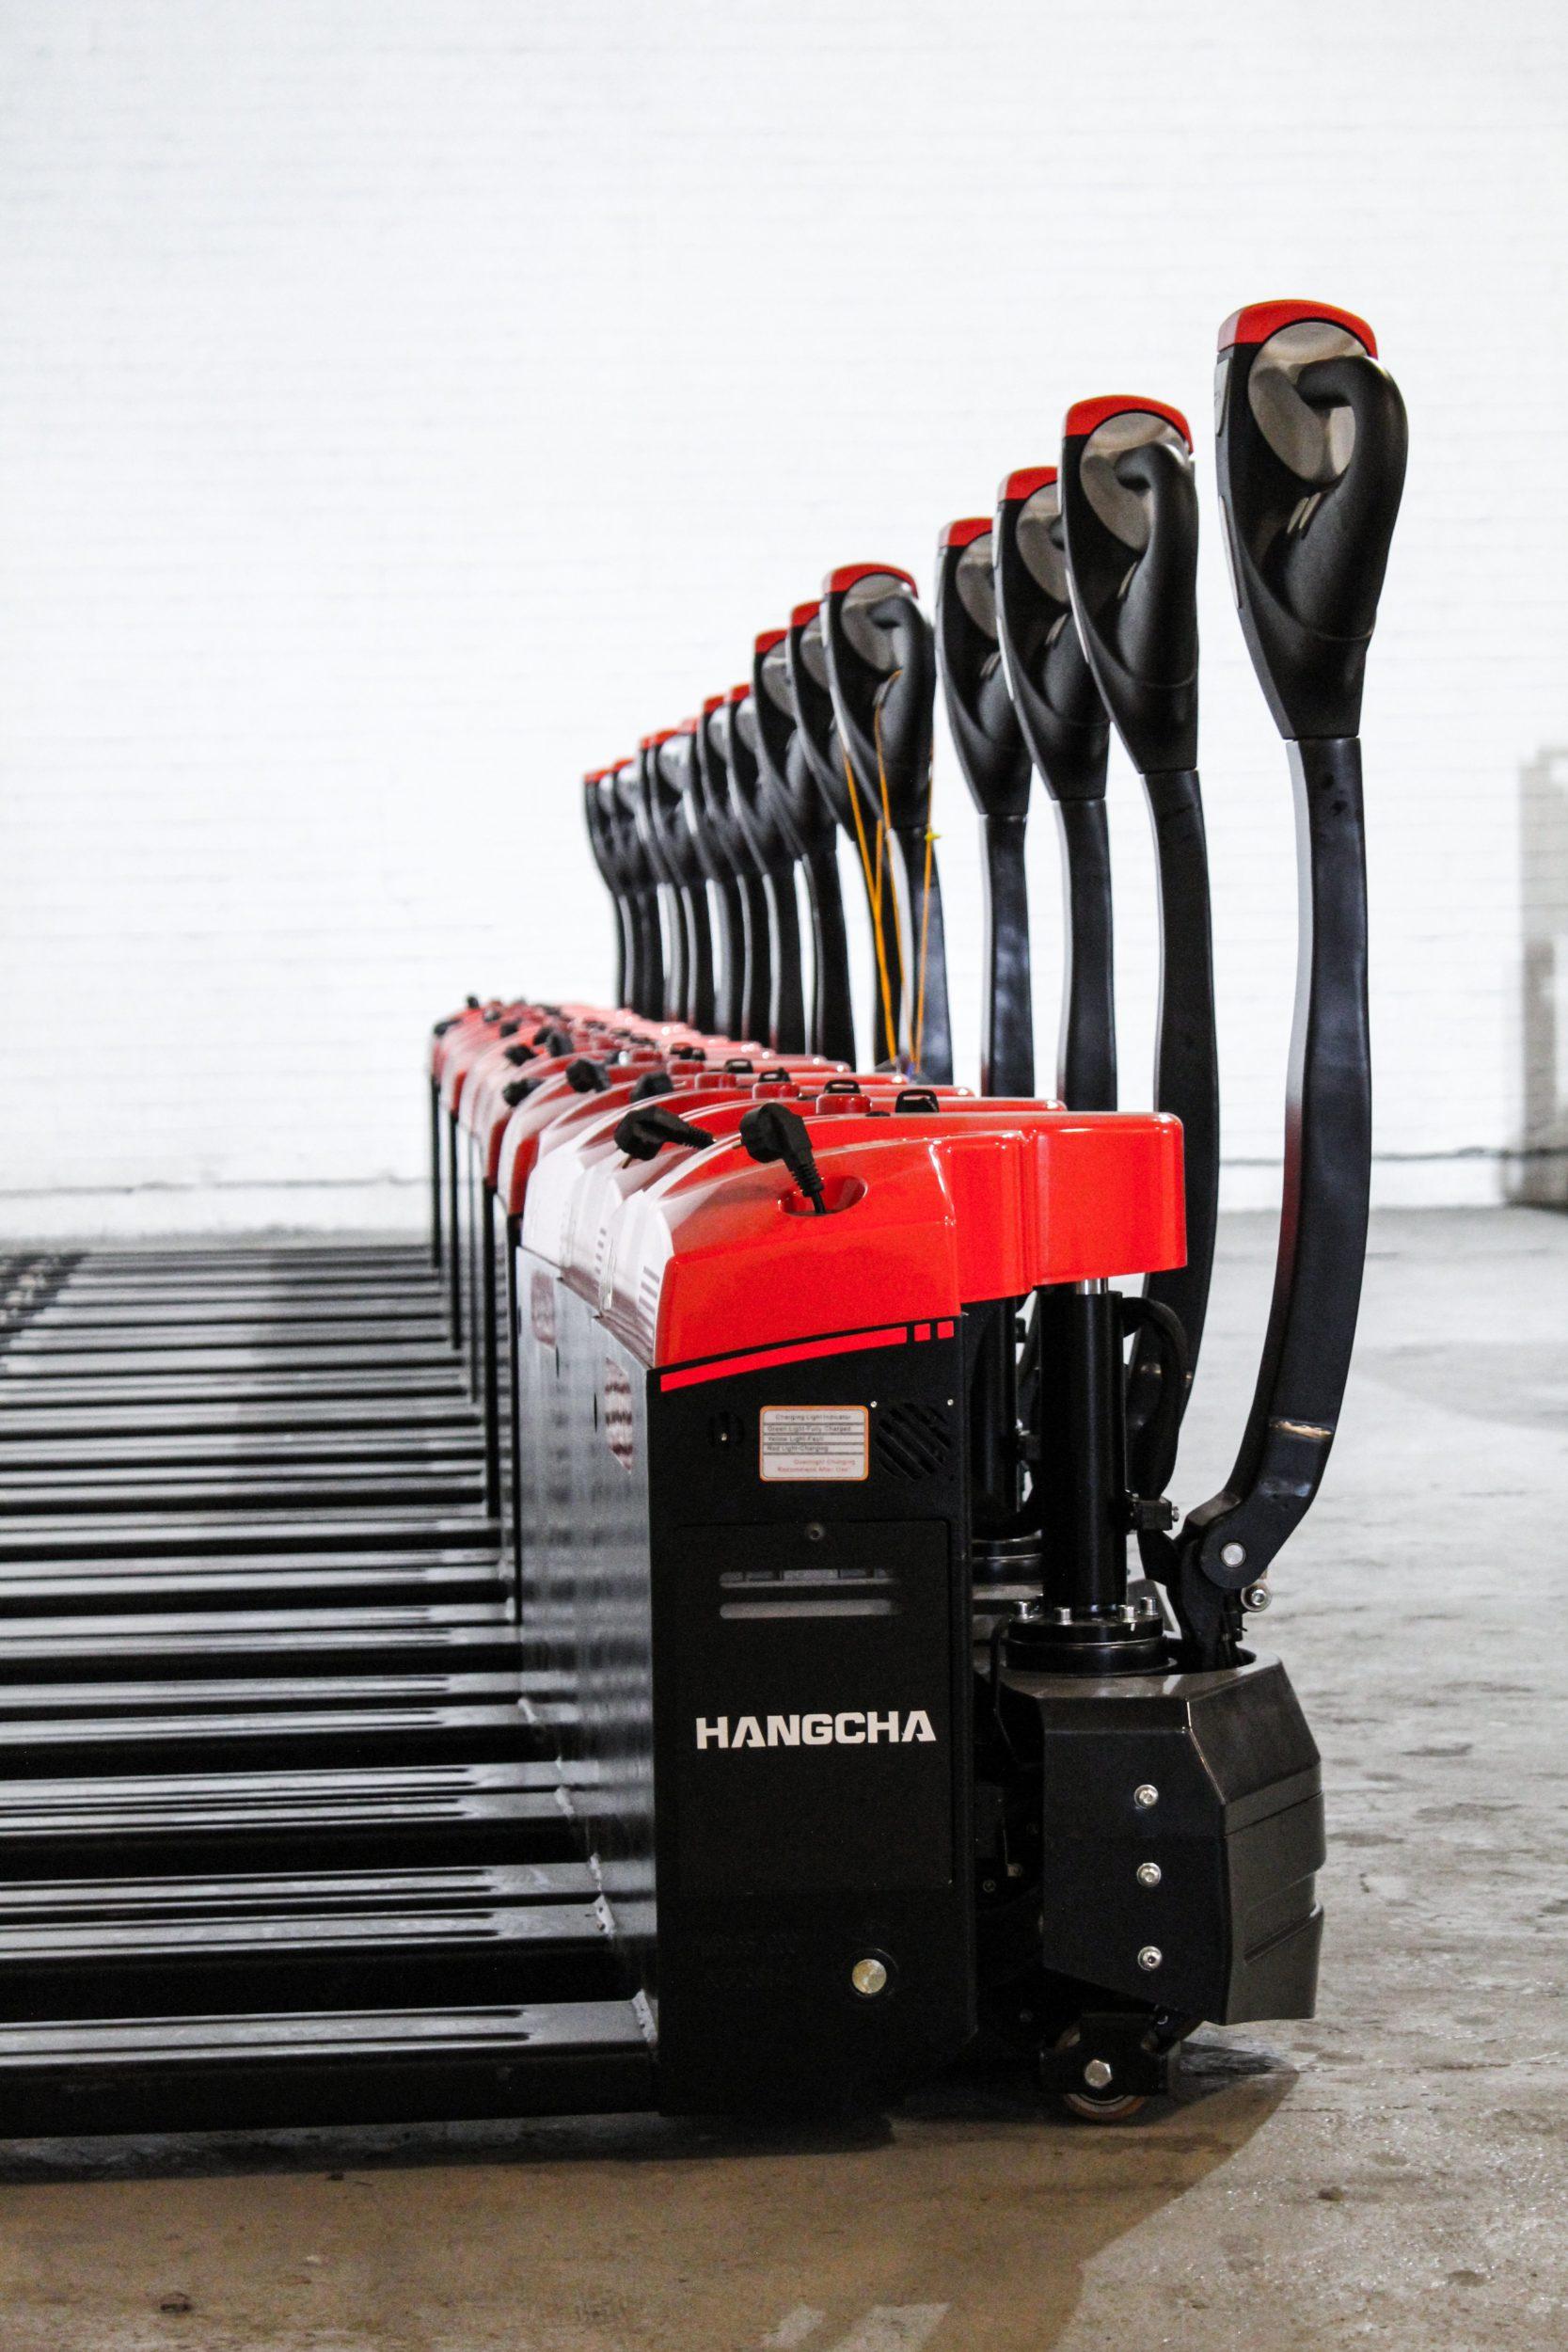 Hangcha-Varehusmaskiner-Ådalen-Truck